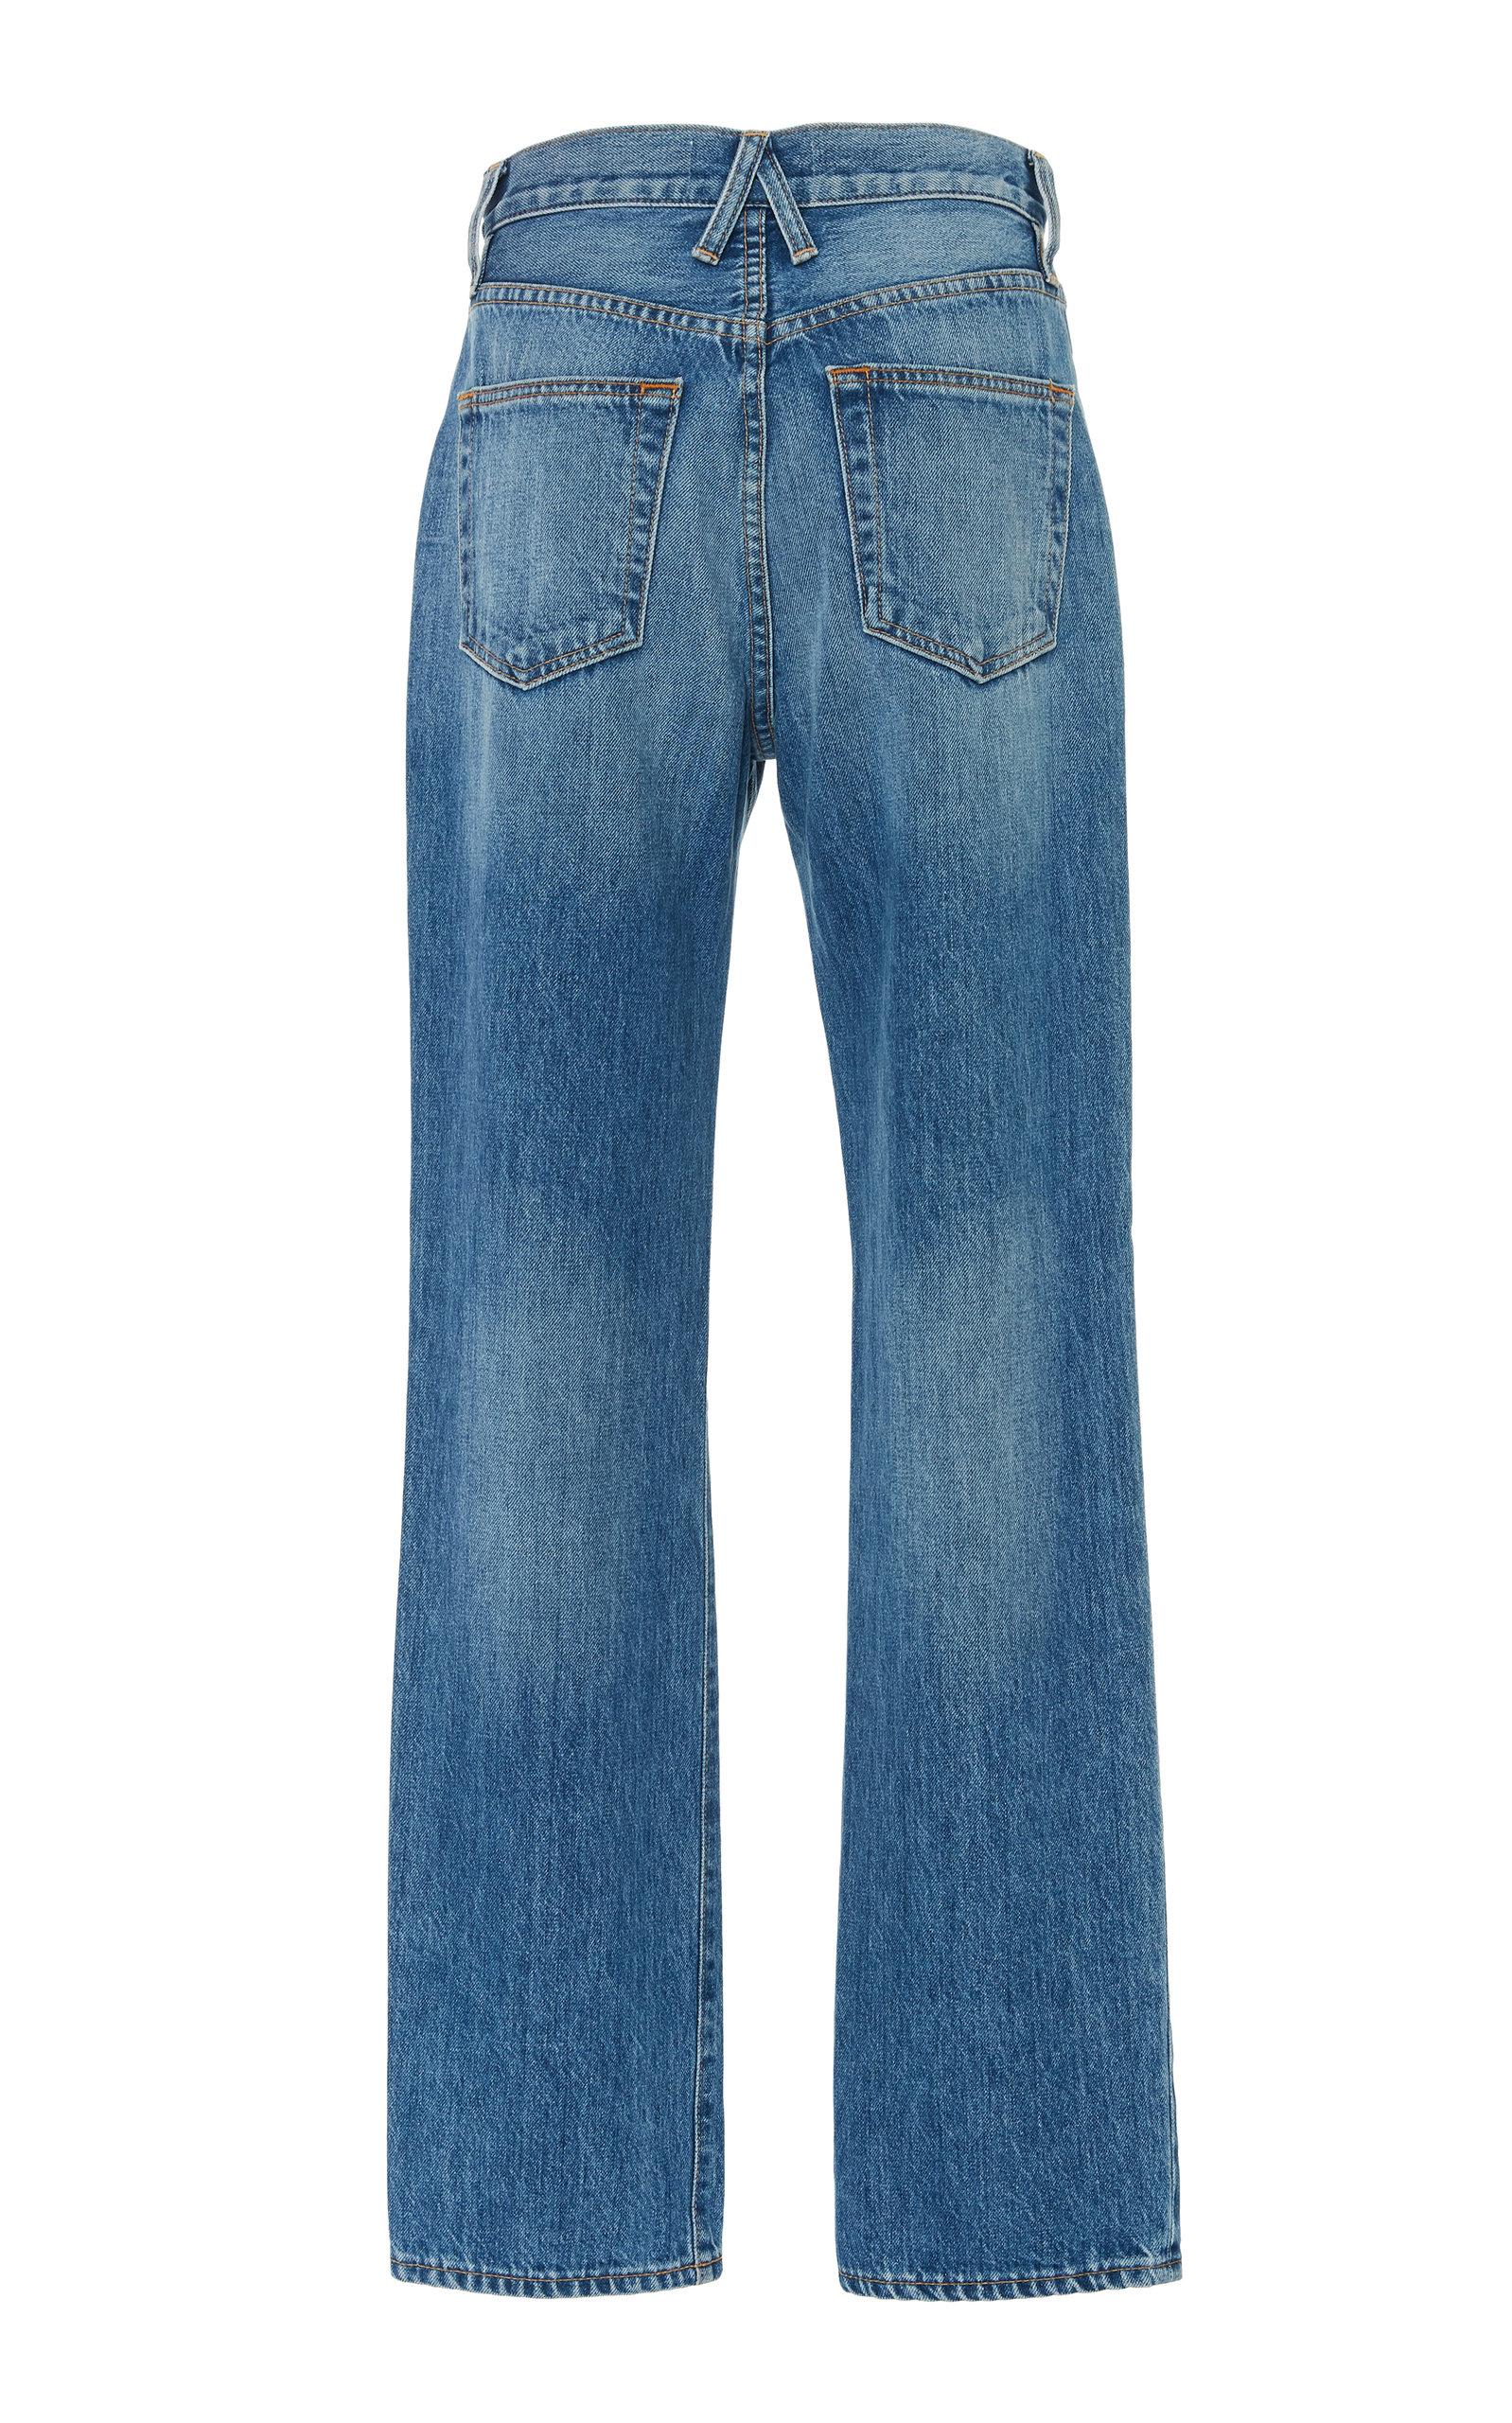 6cc5b5437e6030 SLVRLAKE DenimLondon High-Waisted Straight-Leg Jeans. CLOSE. Loading.  Loading